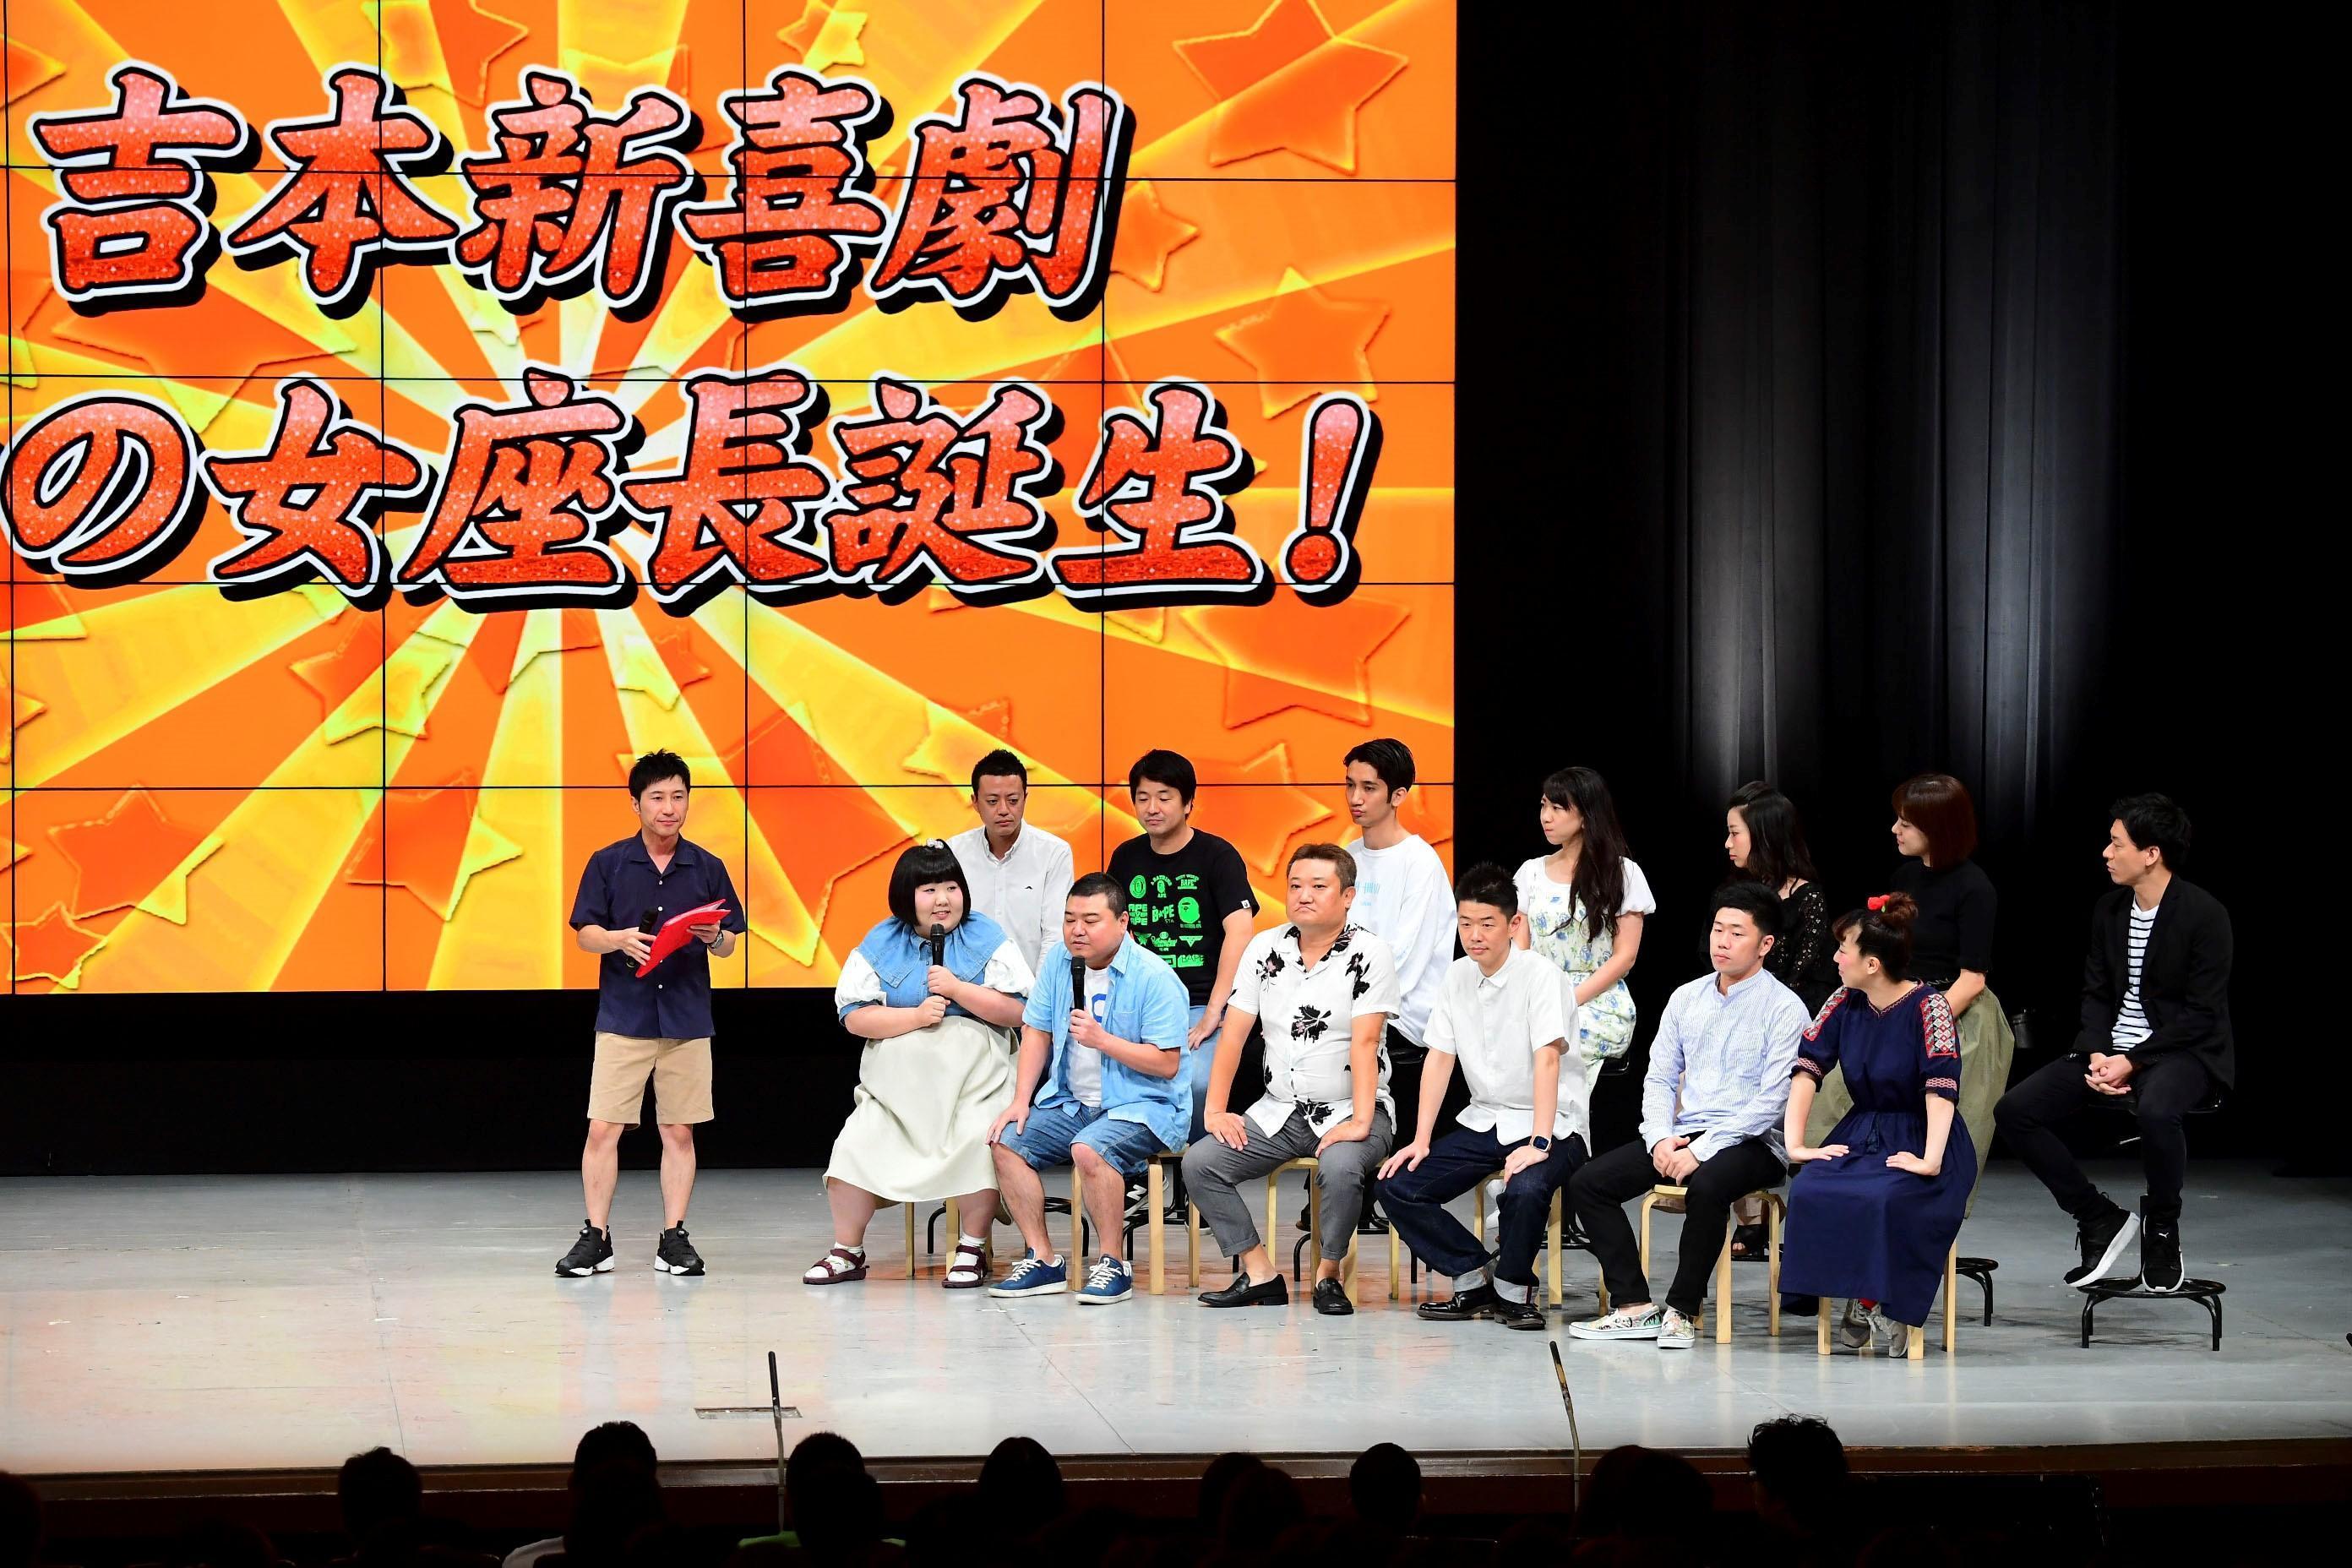 http://news.yoshimoto.co.jp/20170929191527-a66766cb54817c45a3e4e3d4dd148692e91c38c6.jpg